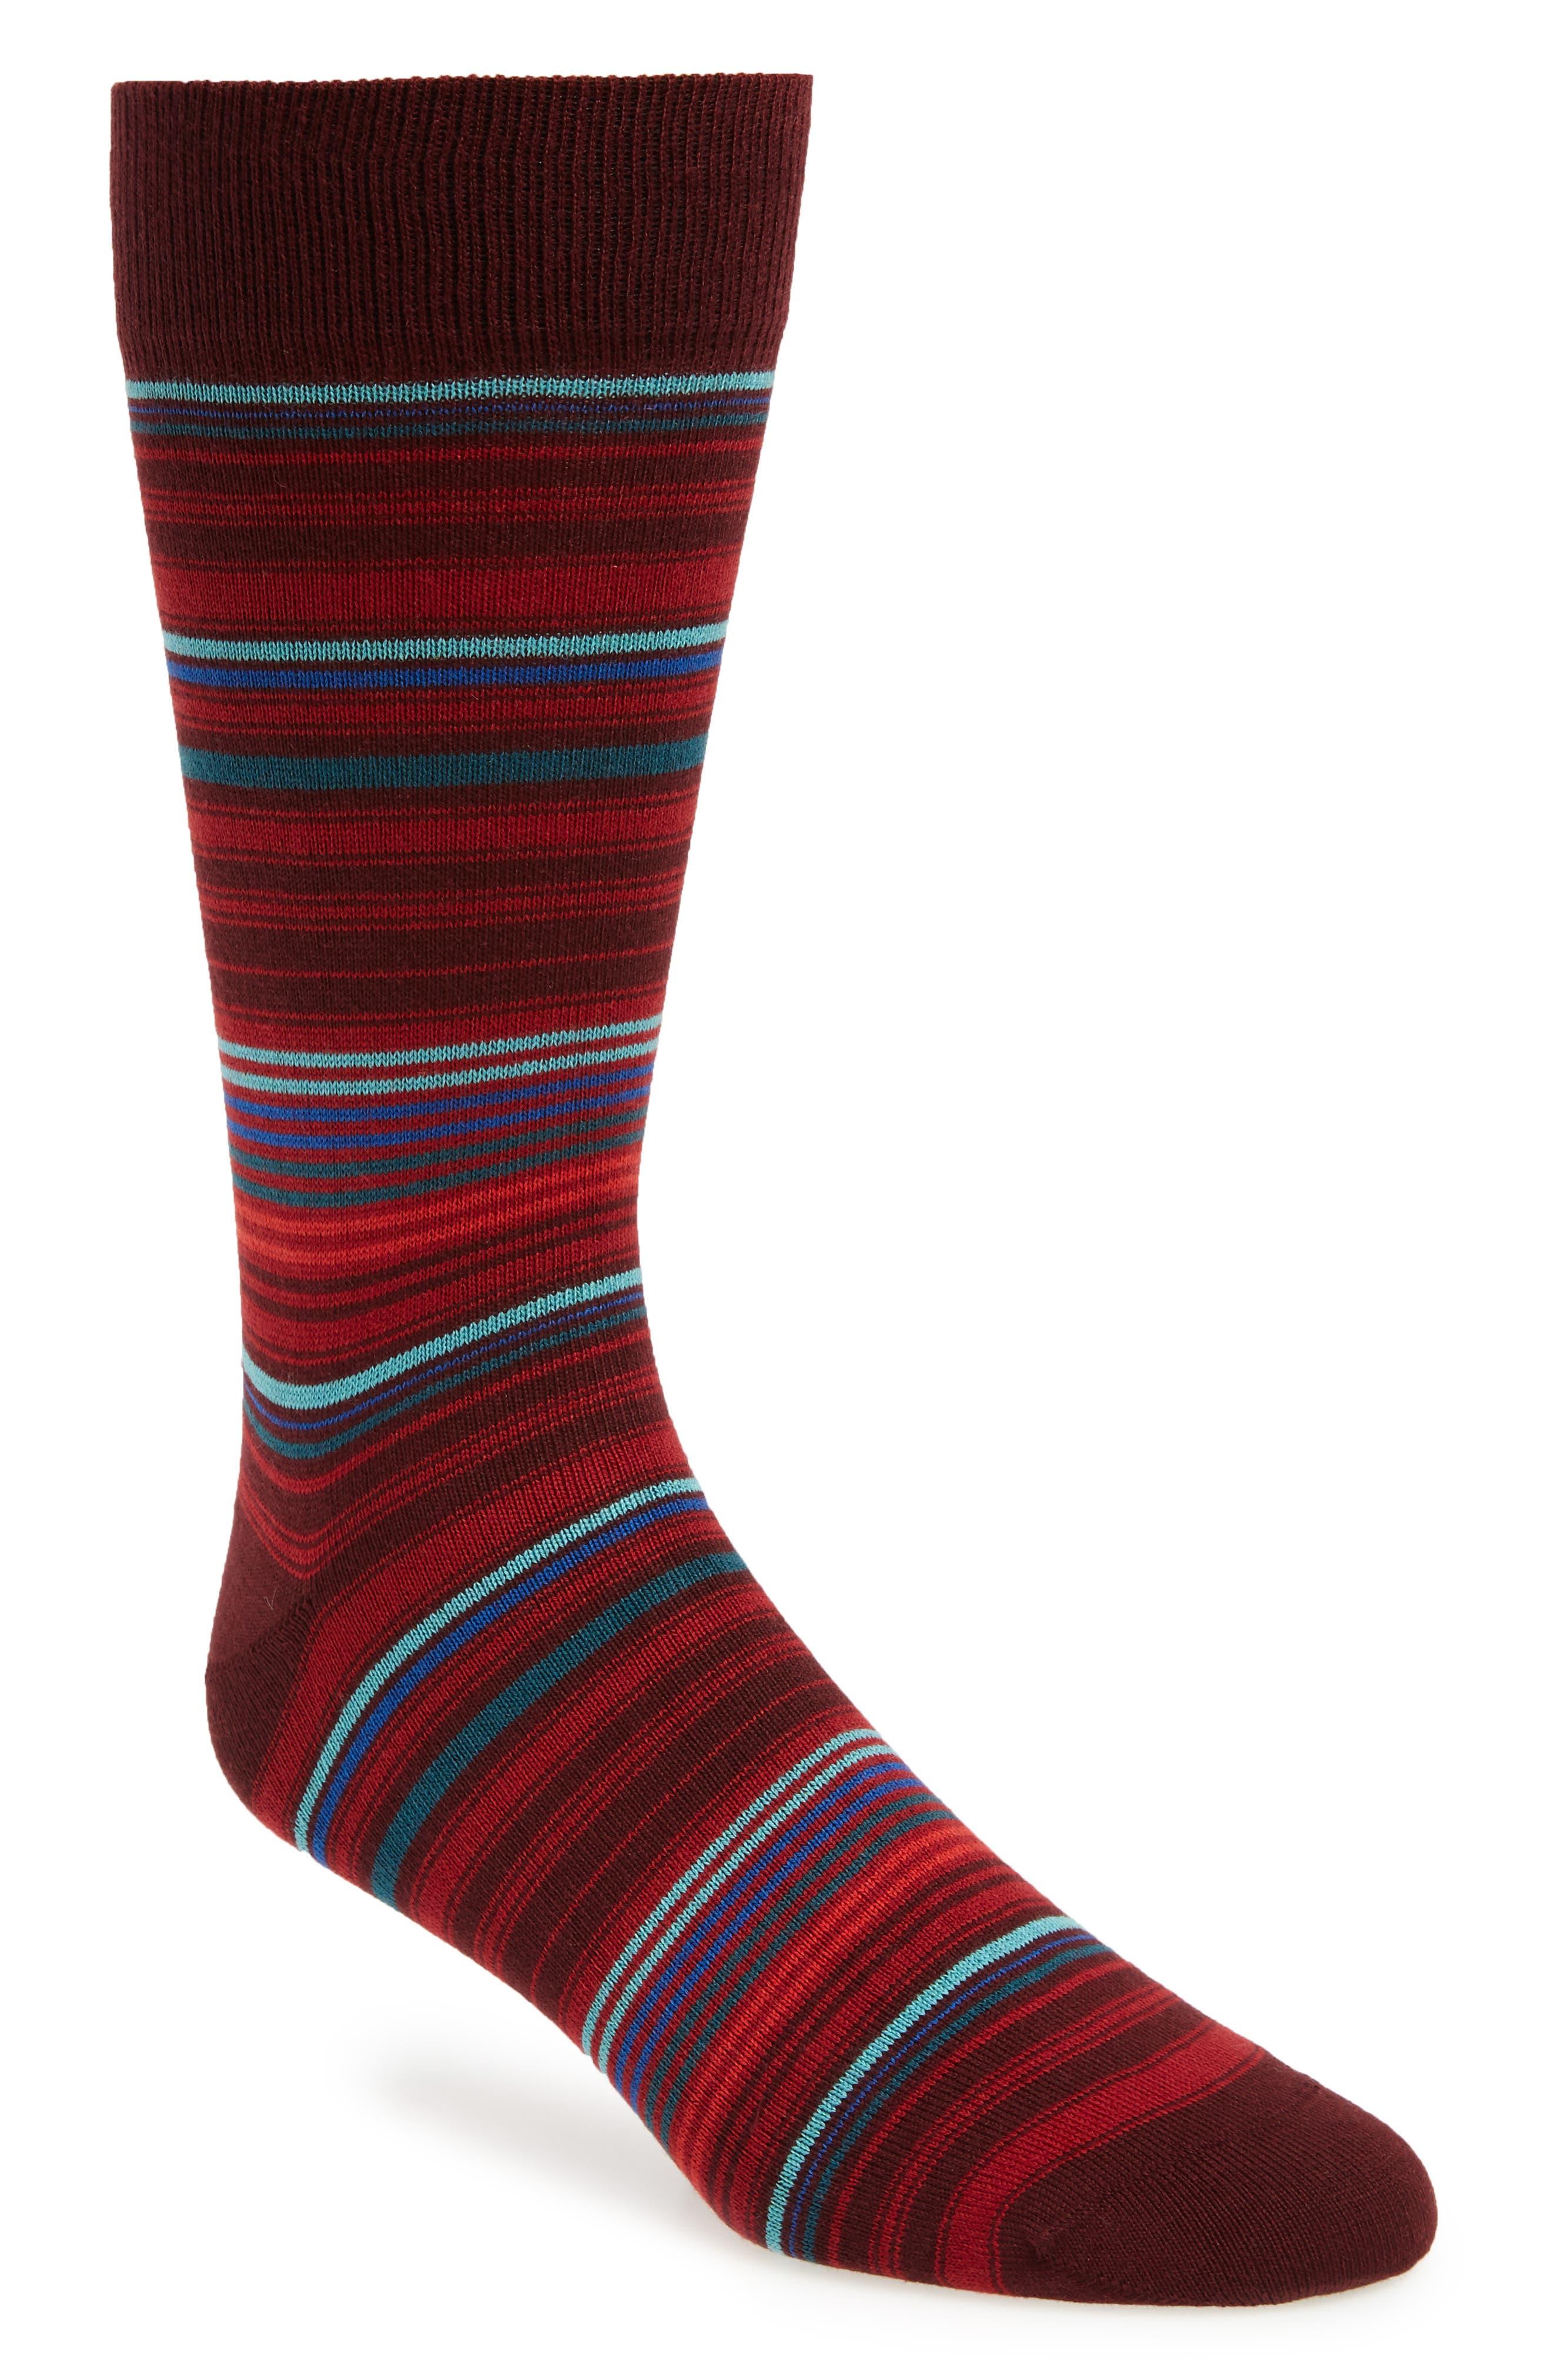 BUGATCHI, Stripe Socks, Main thumbnail 1, color, MAROON